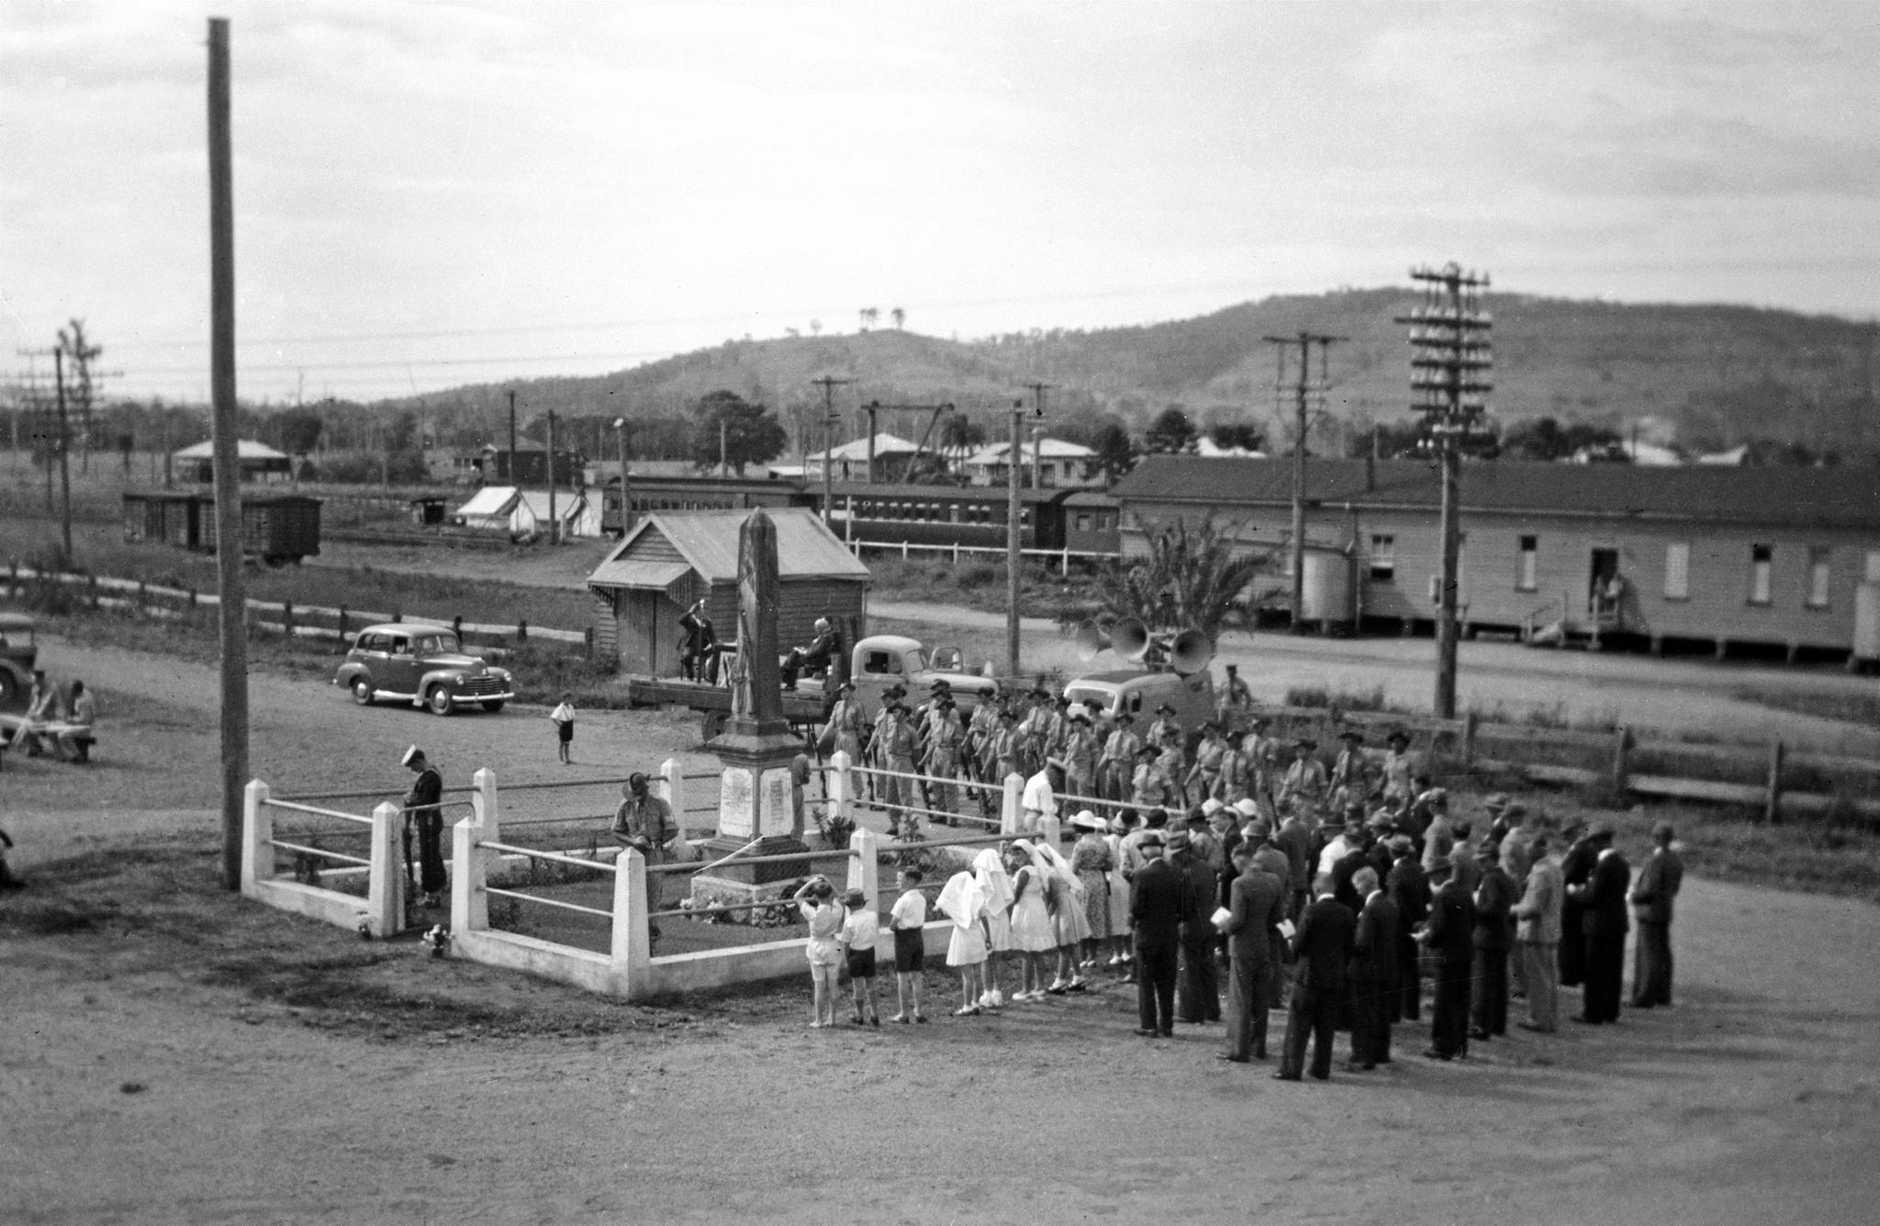 Anzac Day service at the War Memorial, Yandina, 1940s.